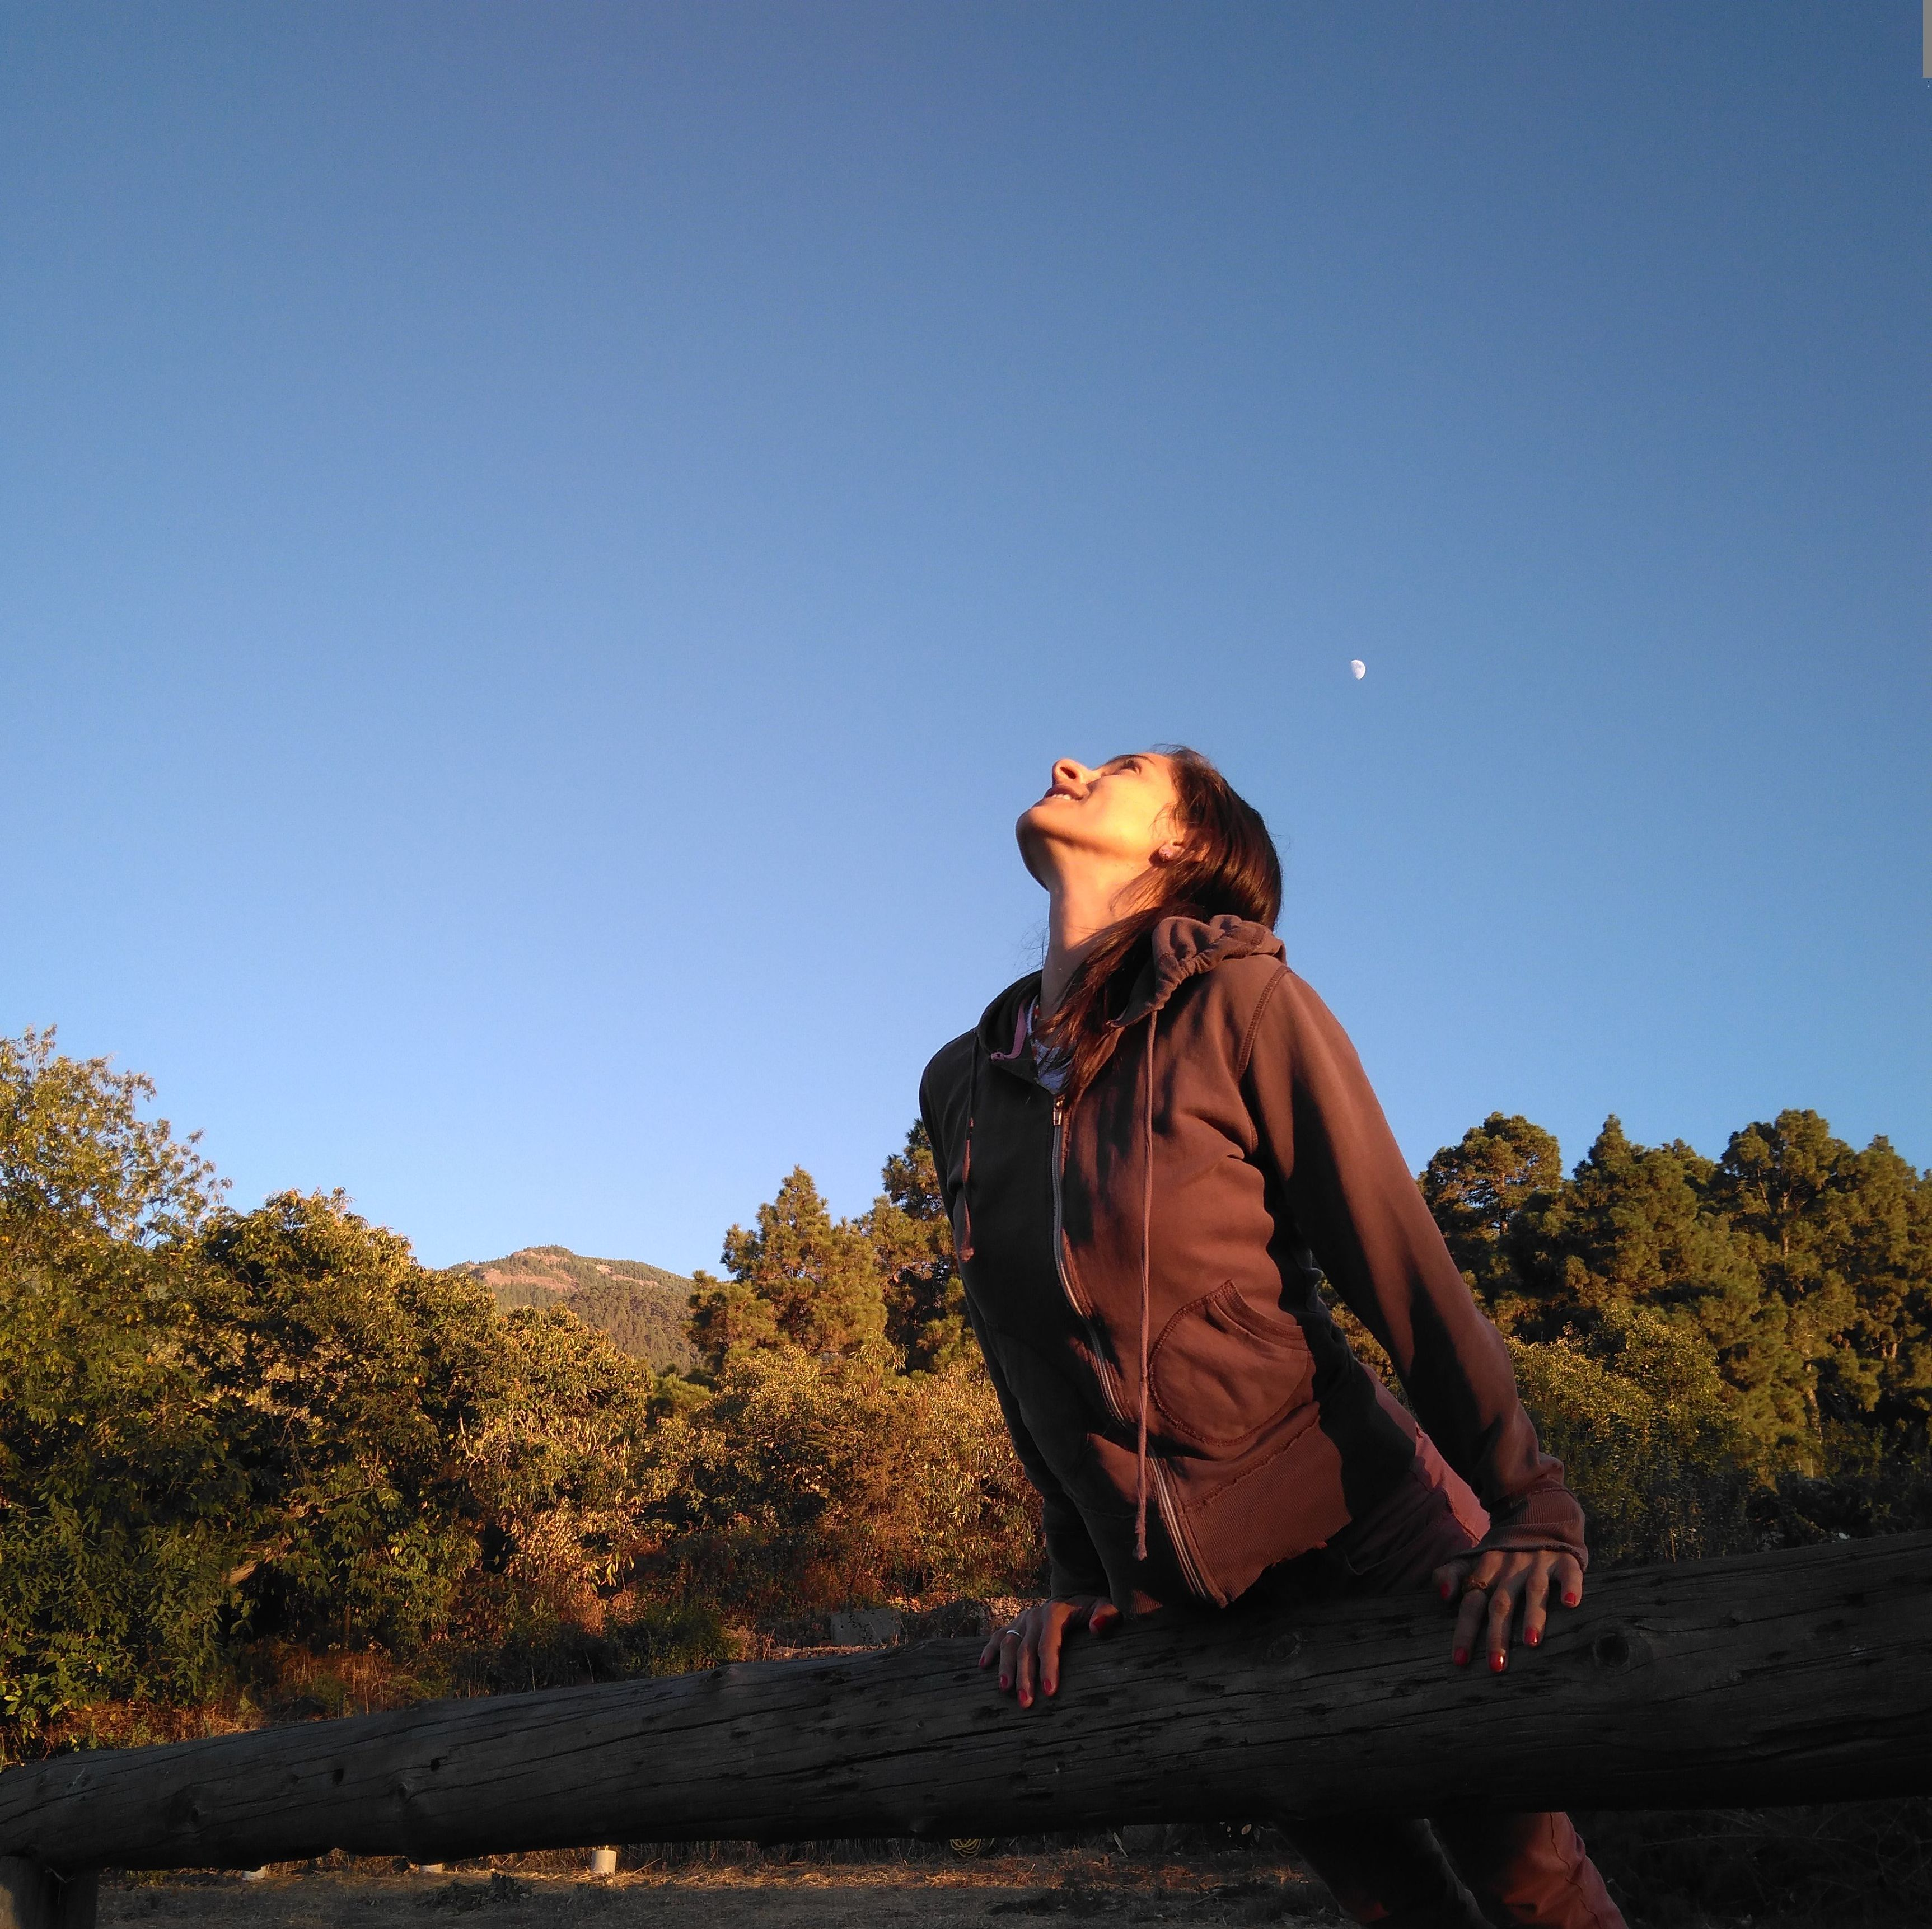 Ama centro de yoga en Santa Cruz de tenerife